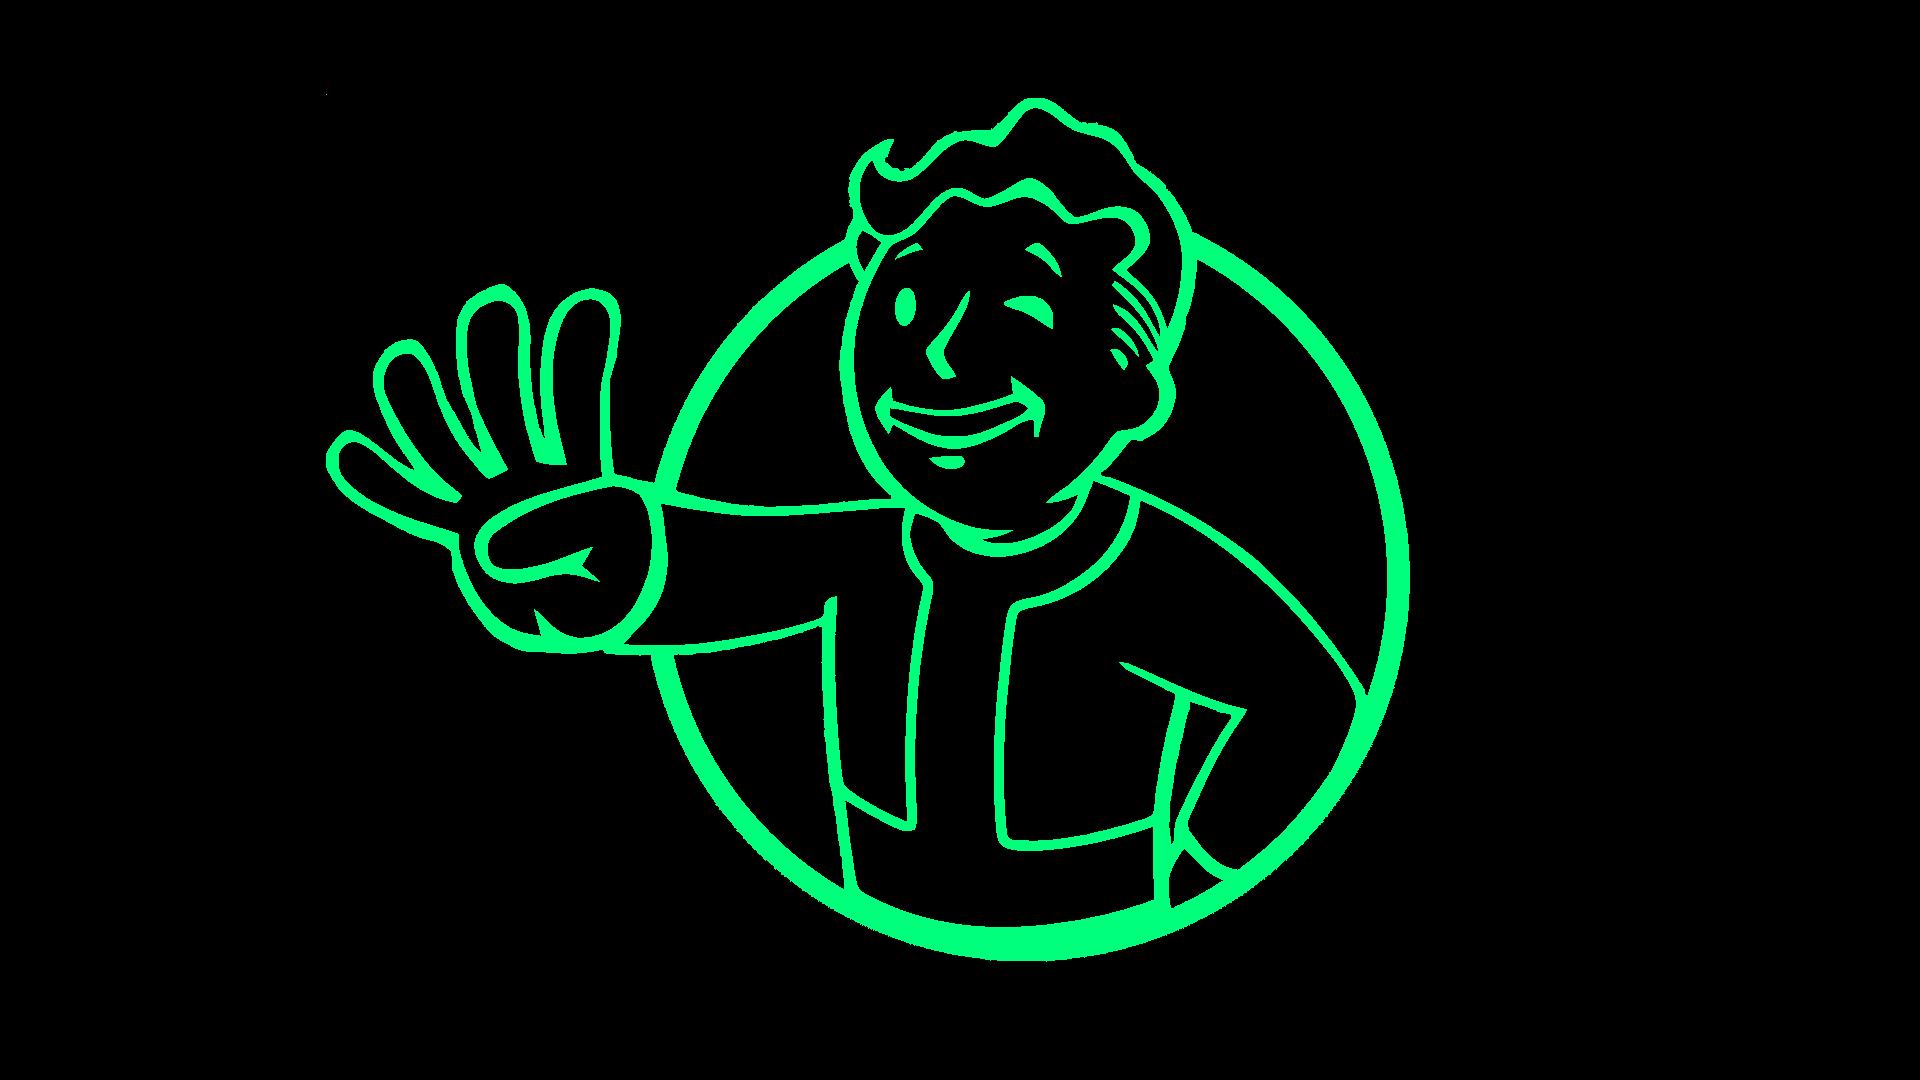 Beautiful Wallpaper Logo Fallout 4 - illustration-text-logo-circle-Fallout-Fallout-4-Vault-Boy-symbol-number-font-organ-109545  Pictures_94837.png